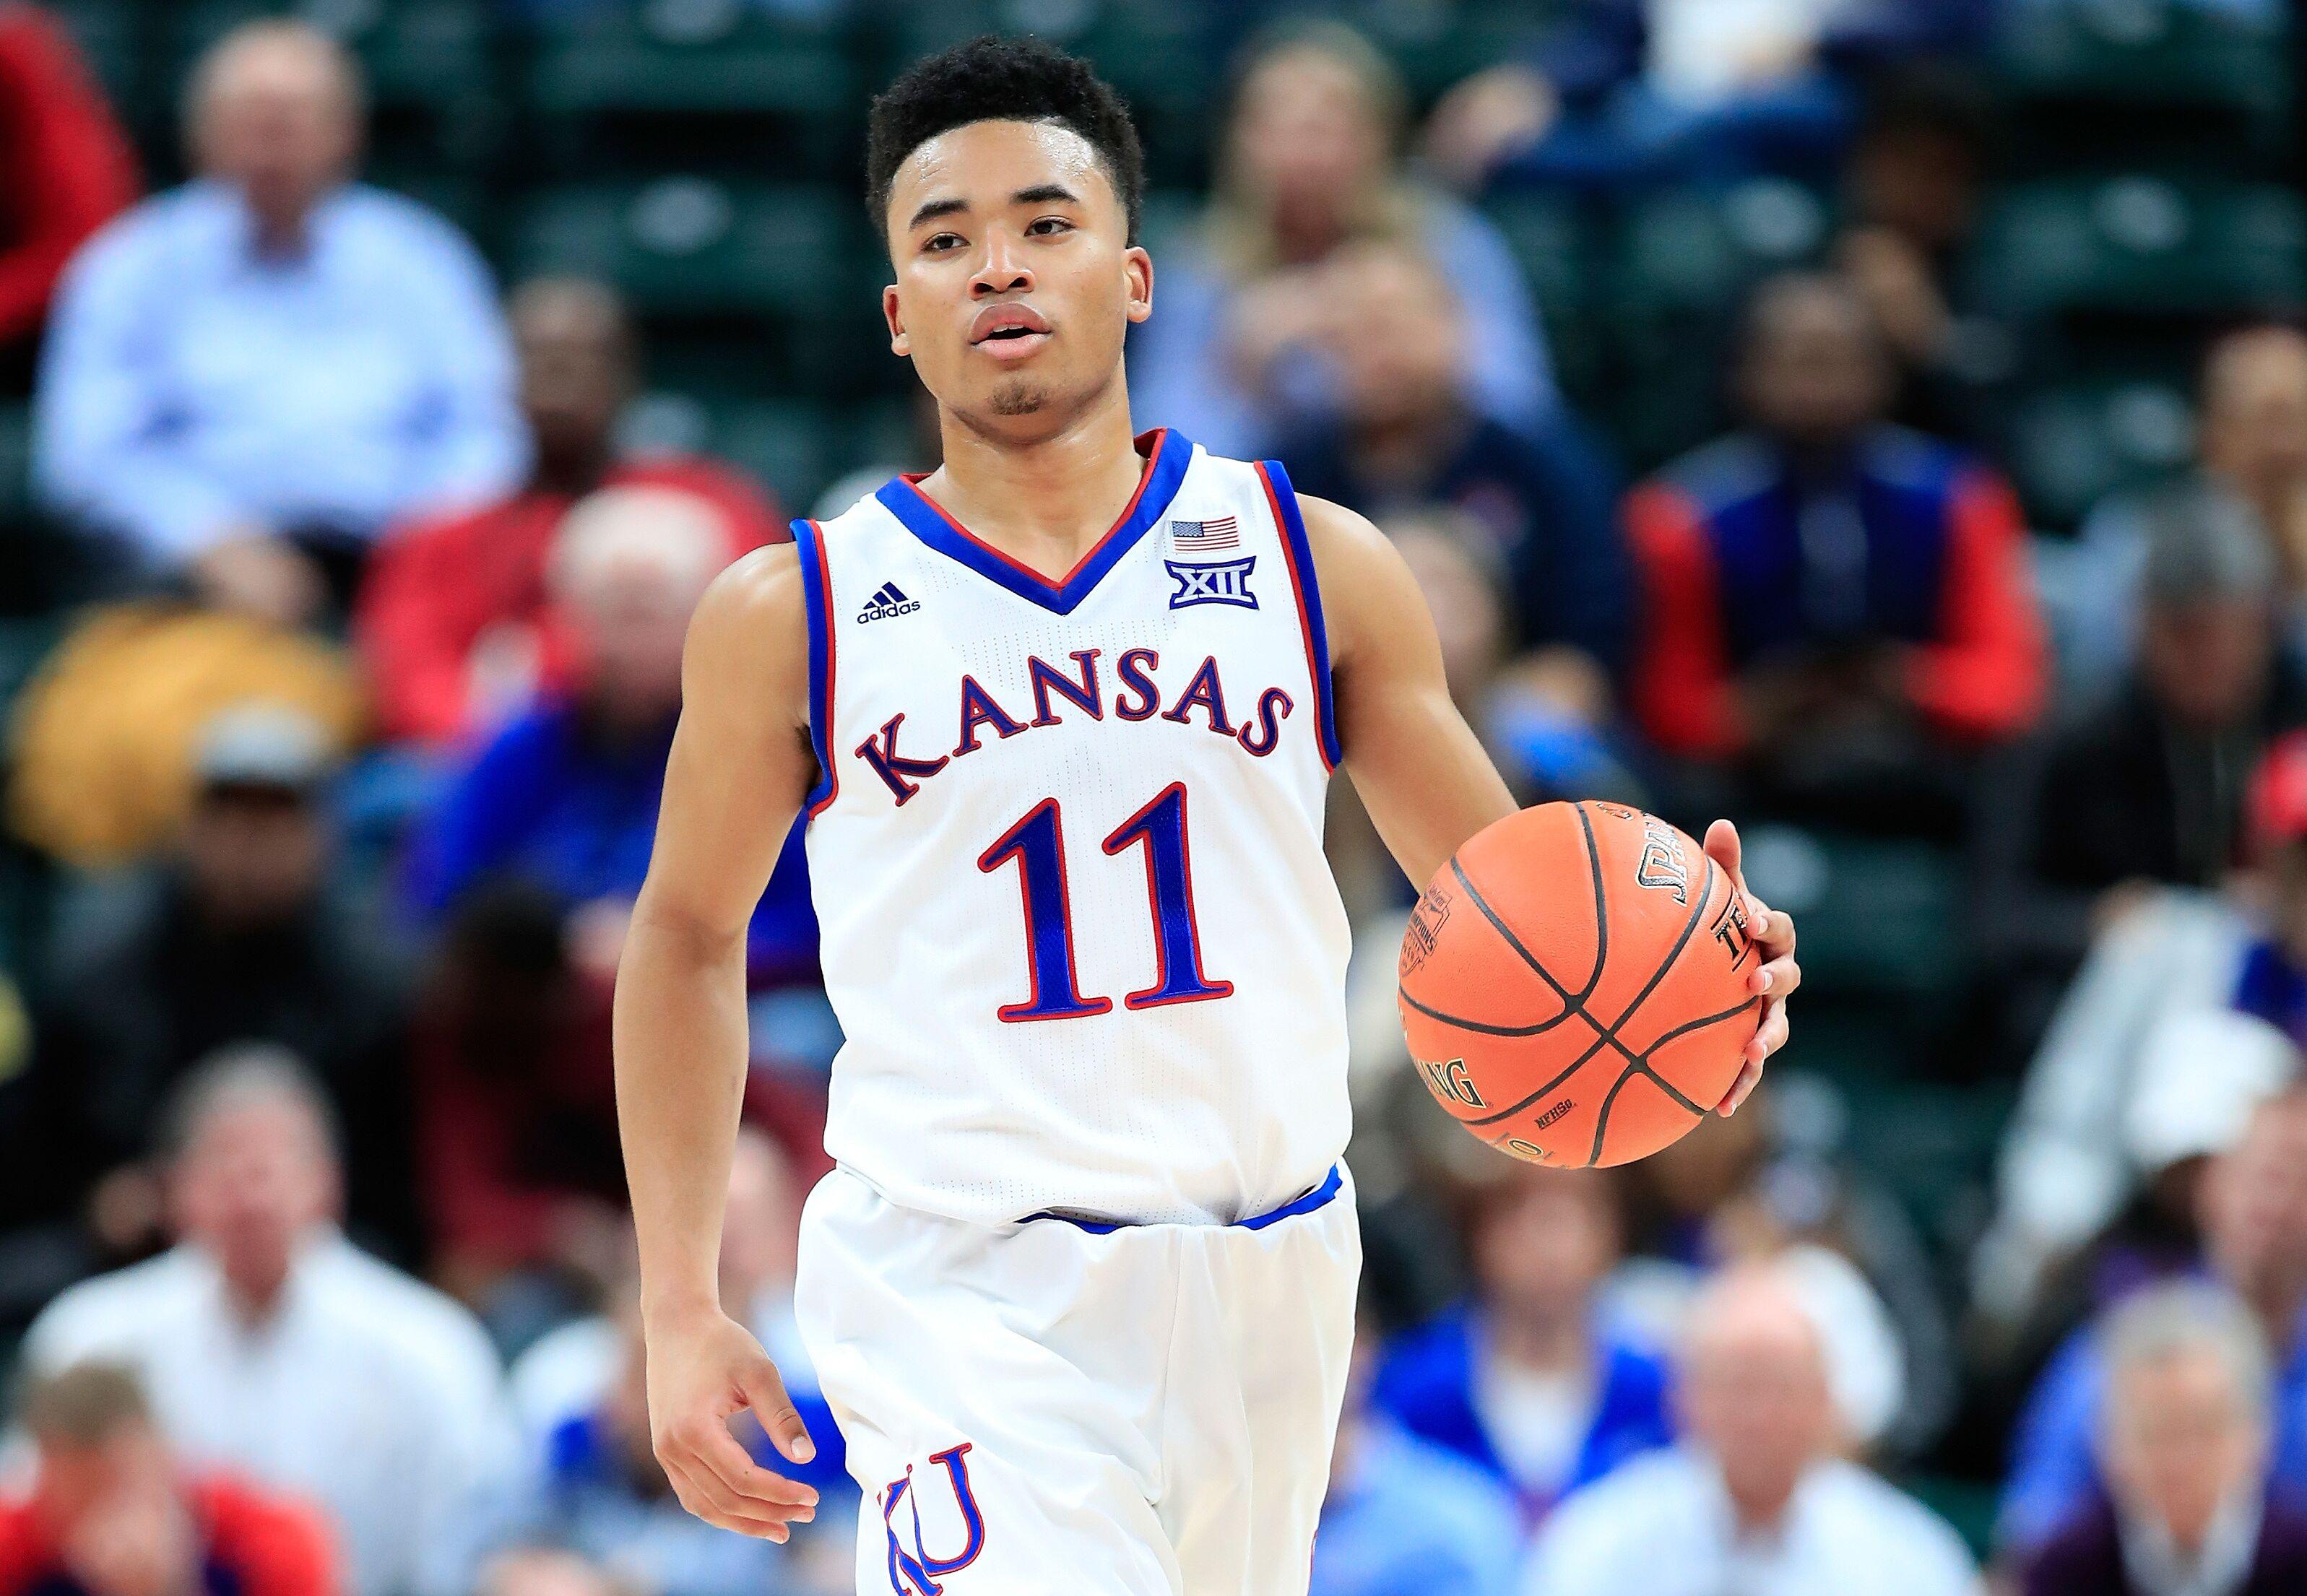 e65366a1a24c March Madness  10 key freshmen in 2019 NCAA Tournament - Page 7